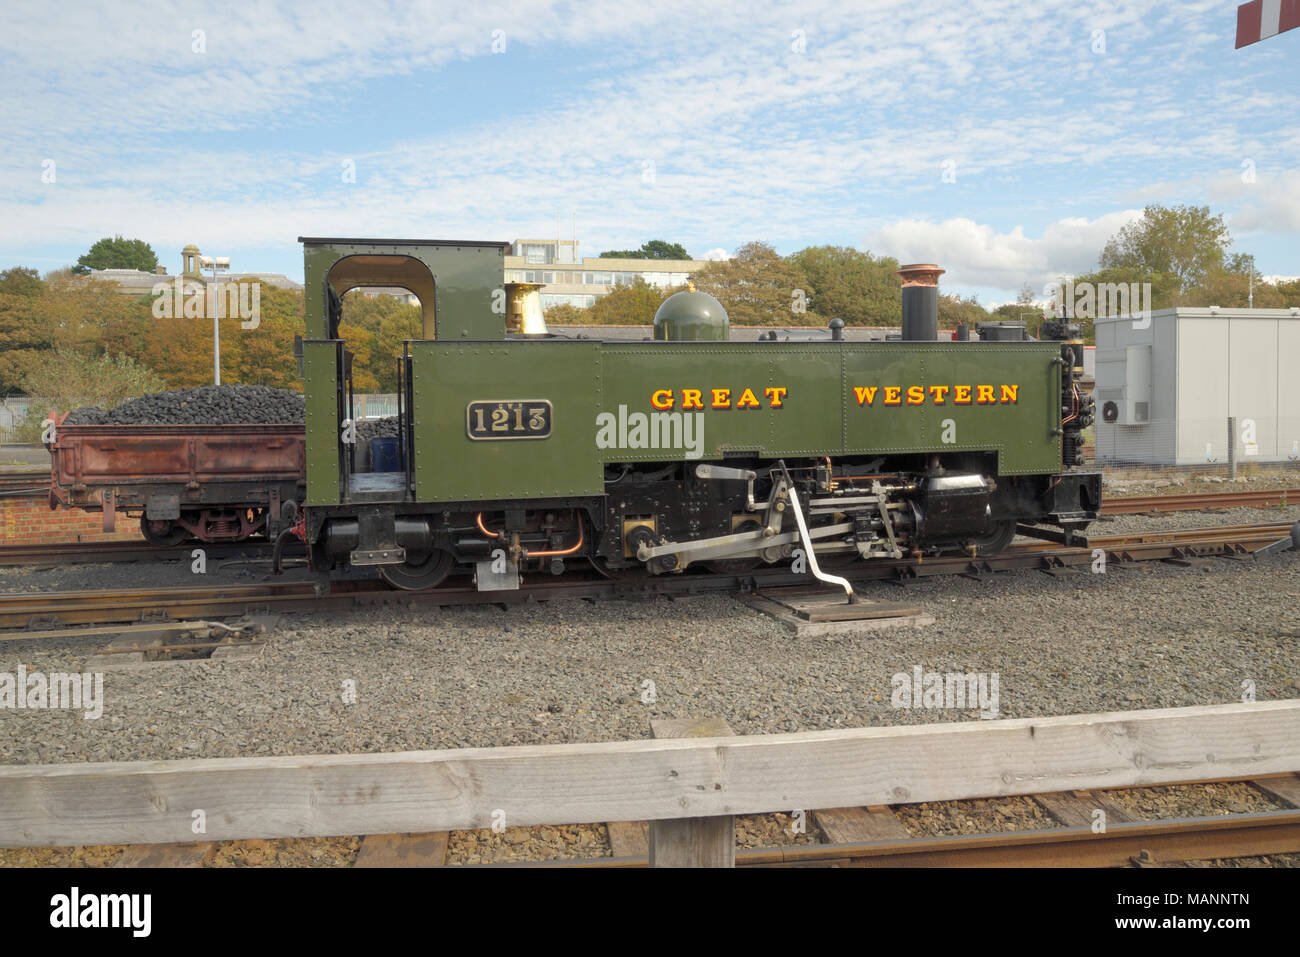 Locomotive: Great Western at Aberystwyth Station - Stock Image